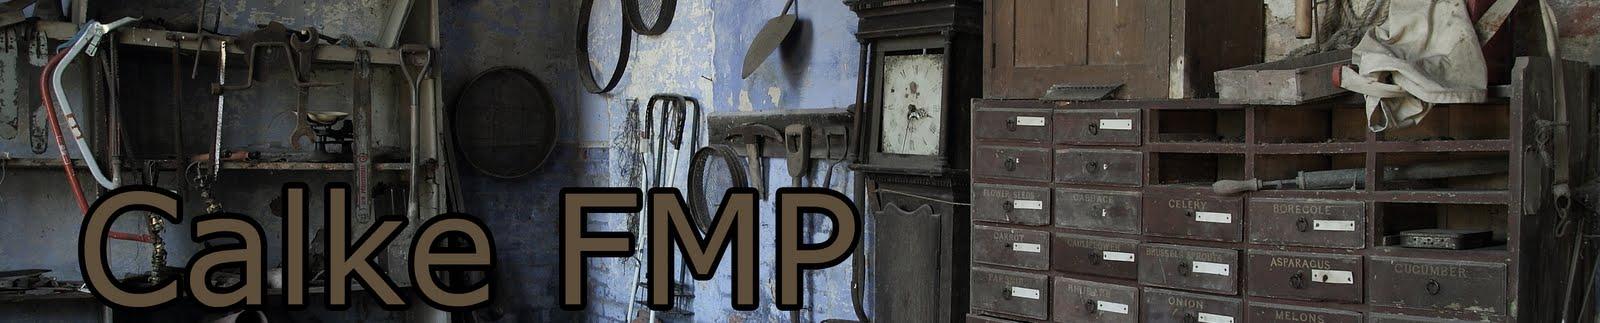 Calke-FMP